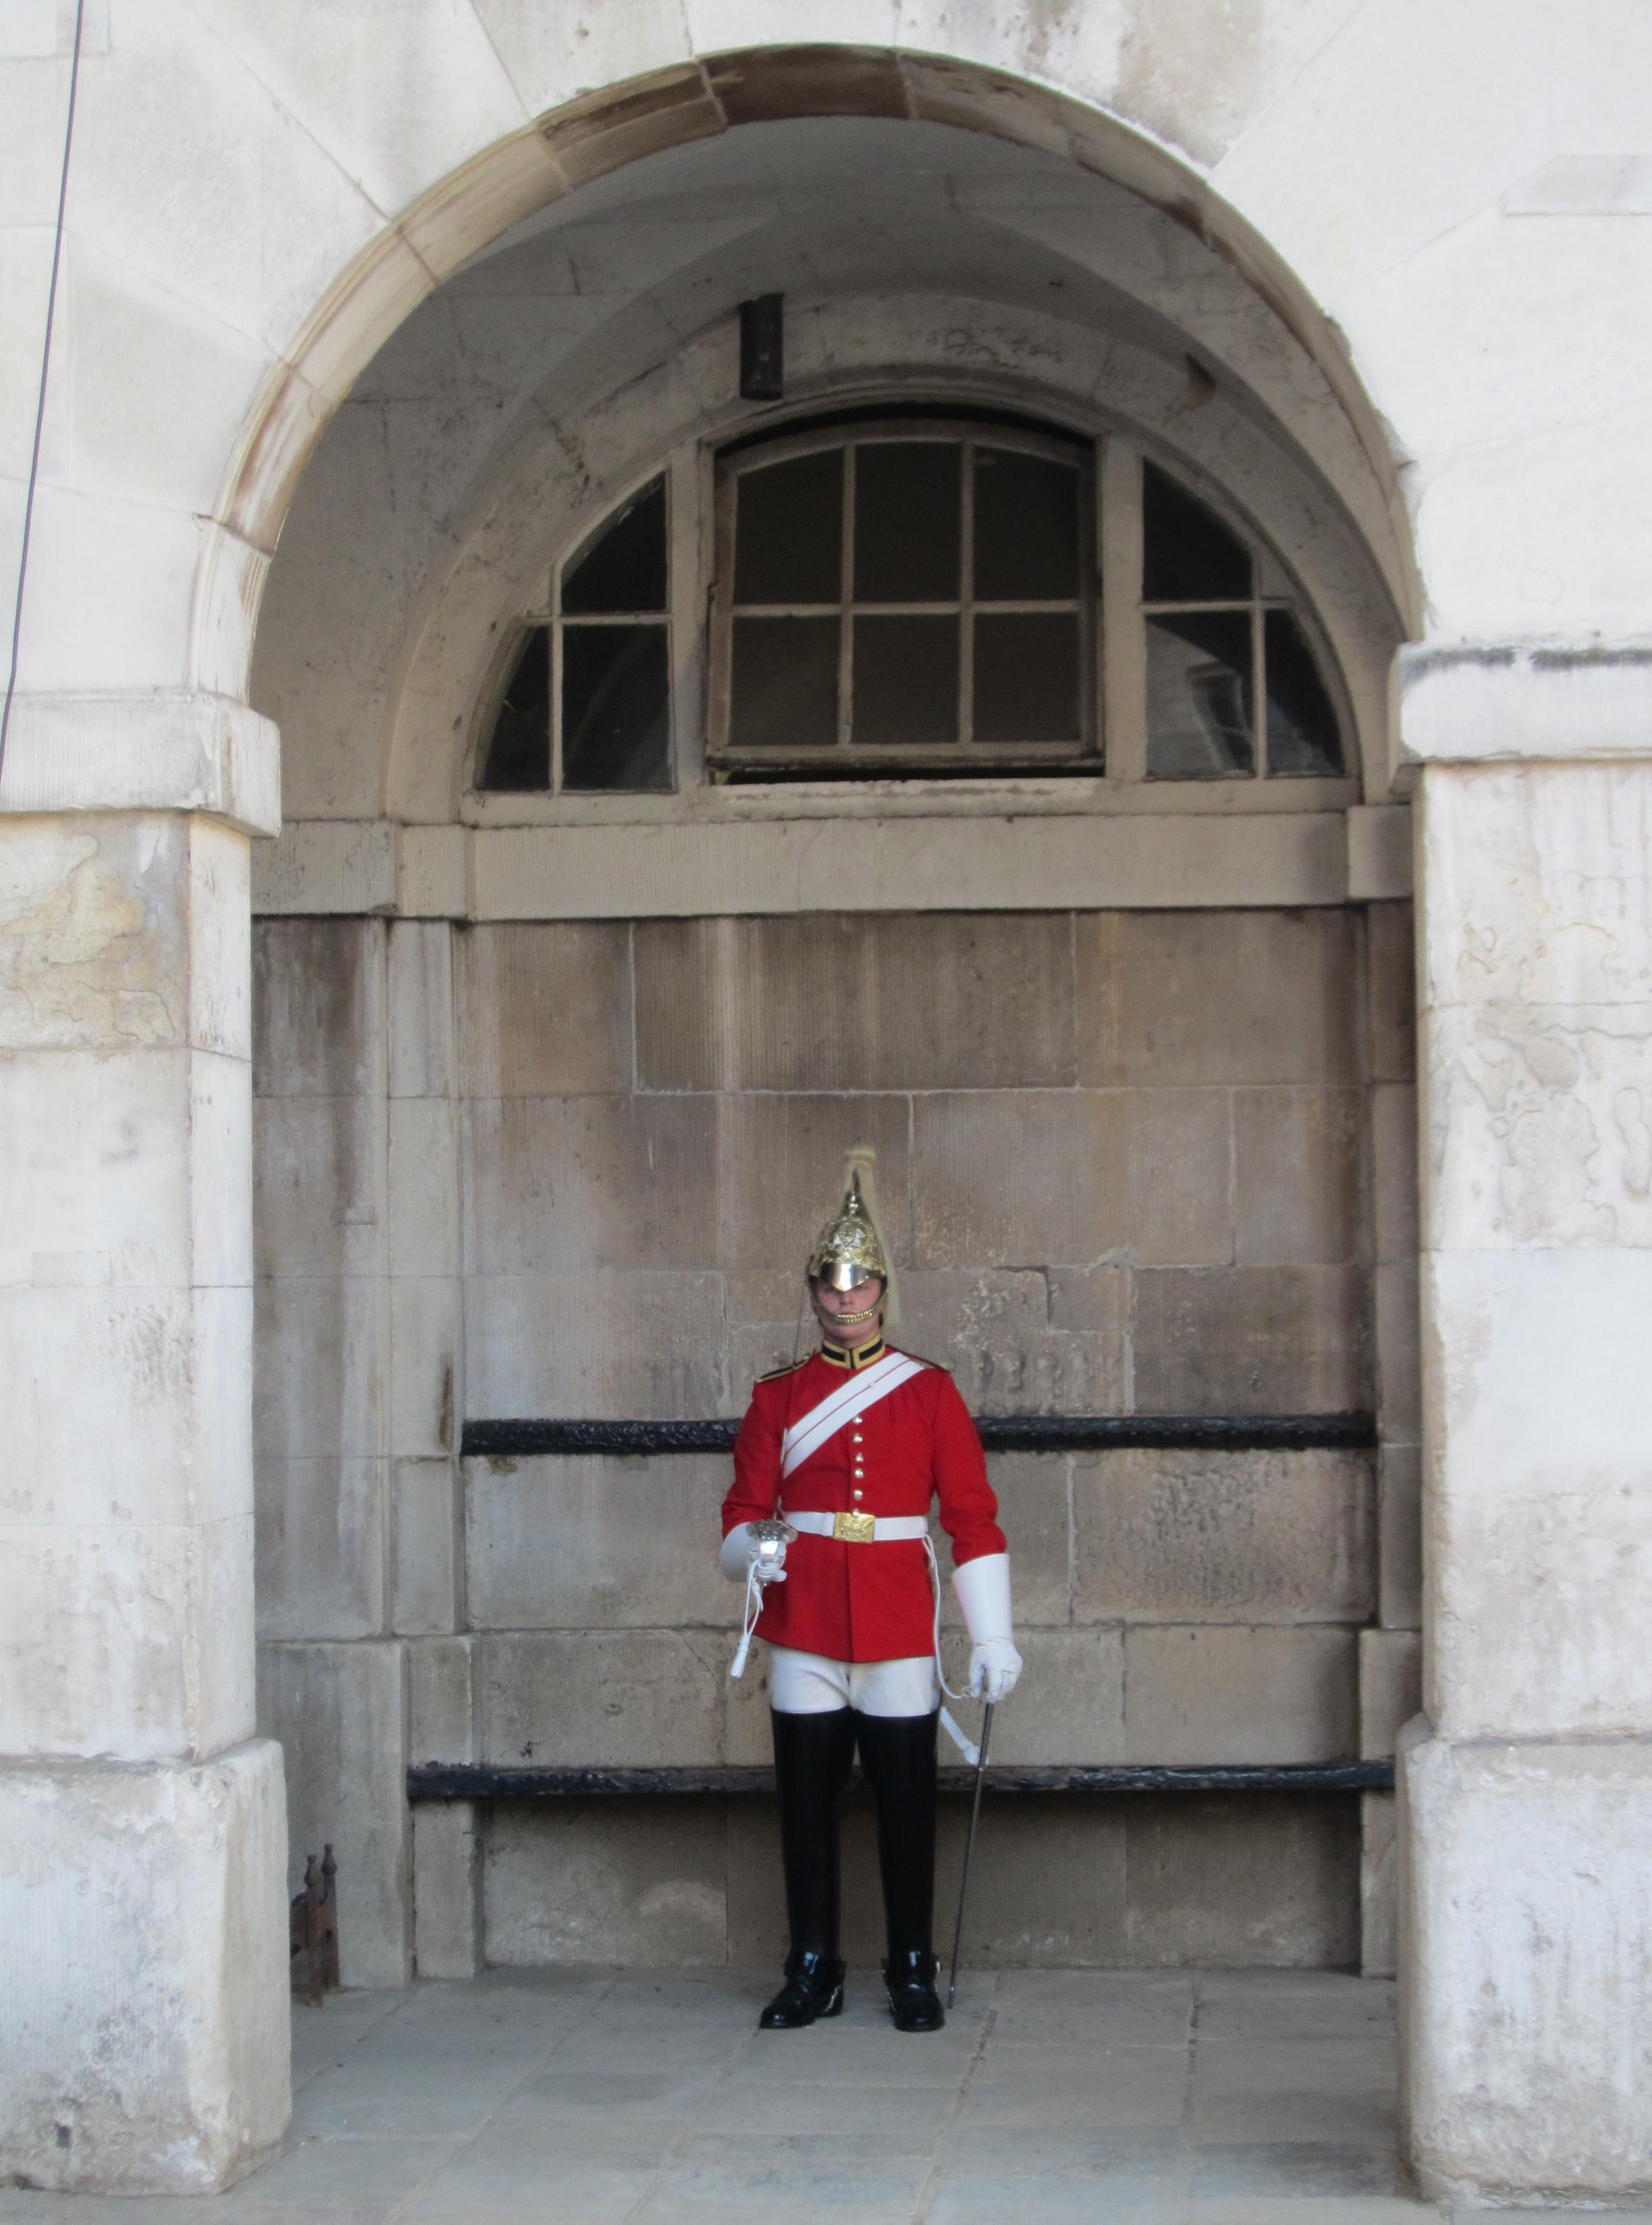 Horse guards, London Royal wedding